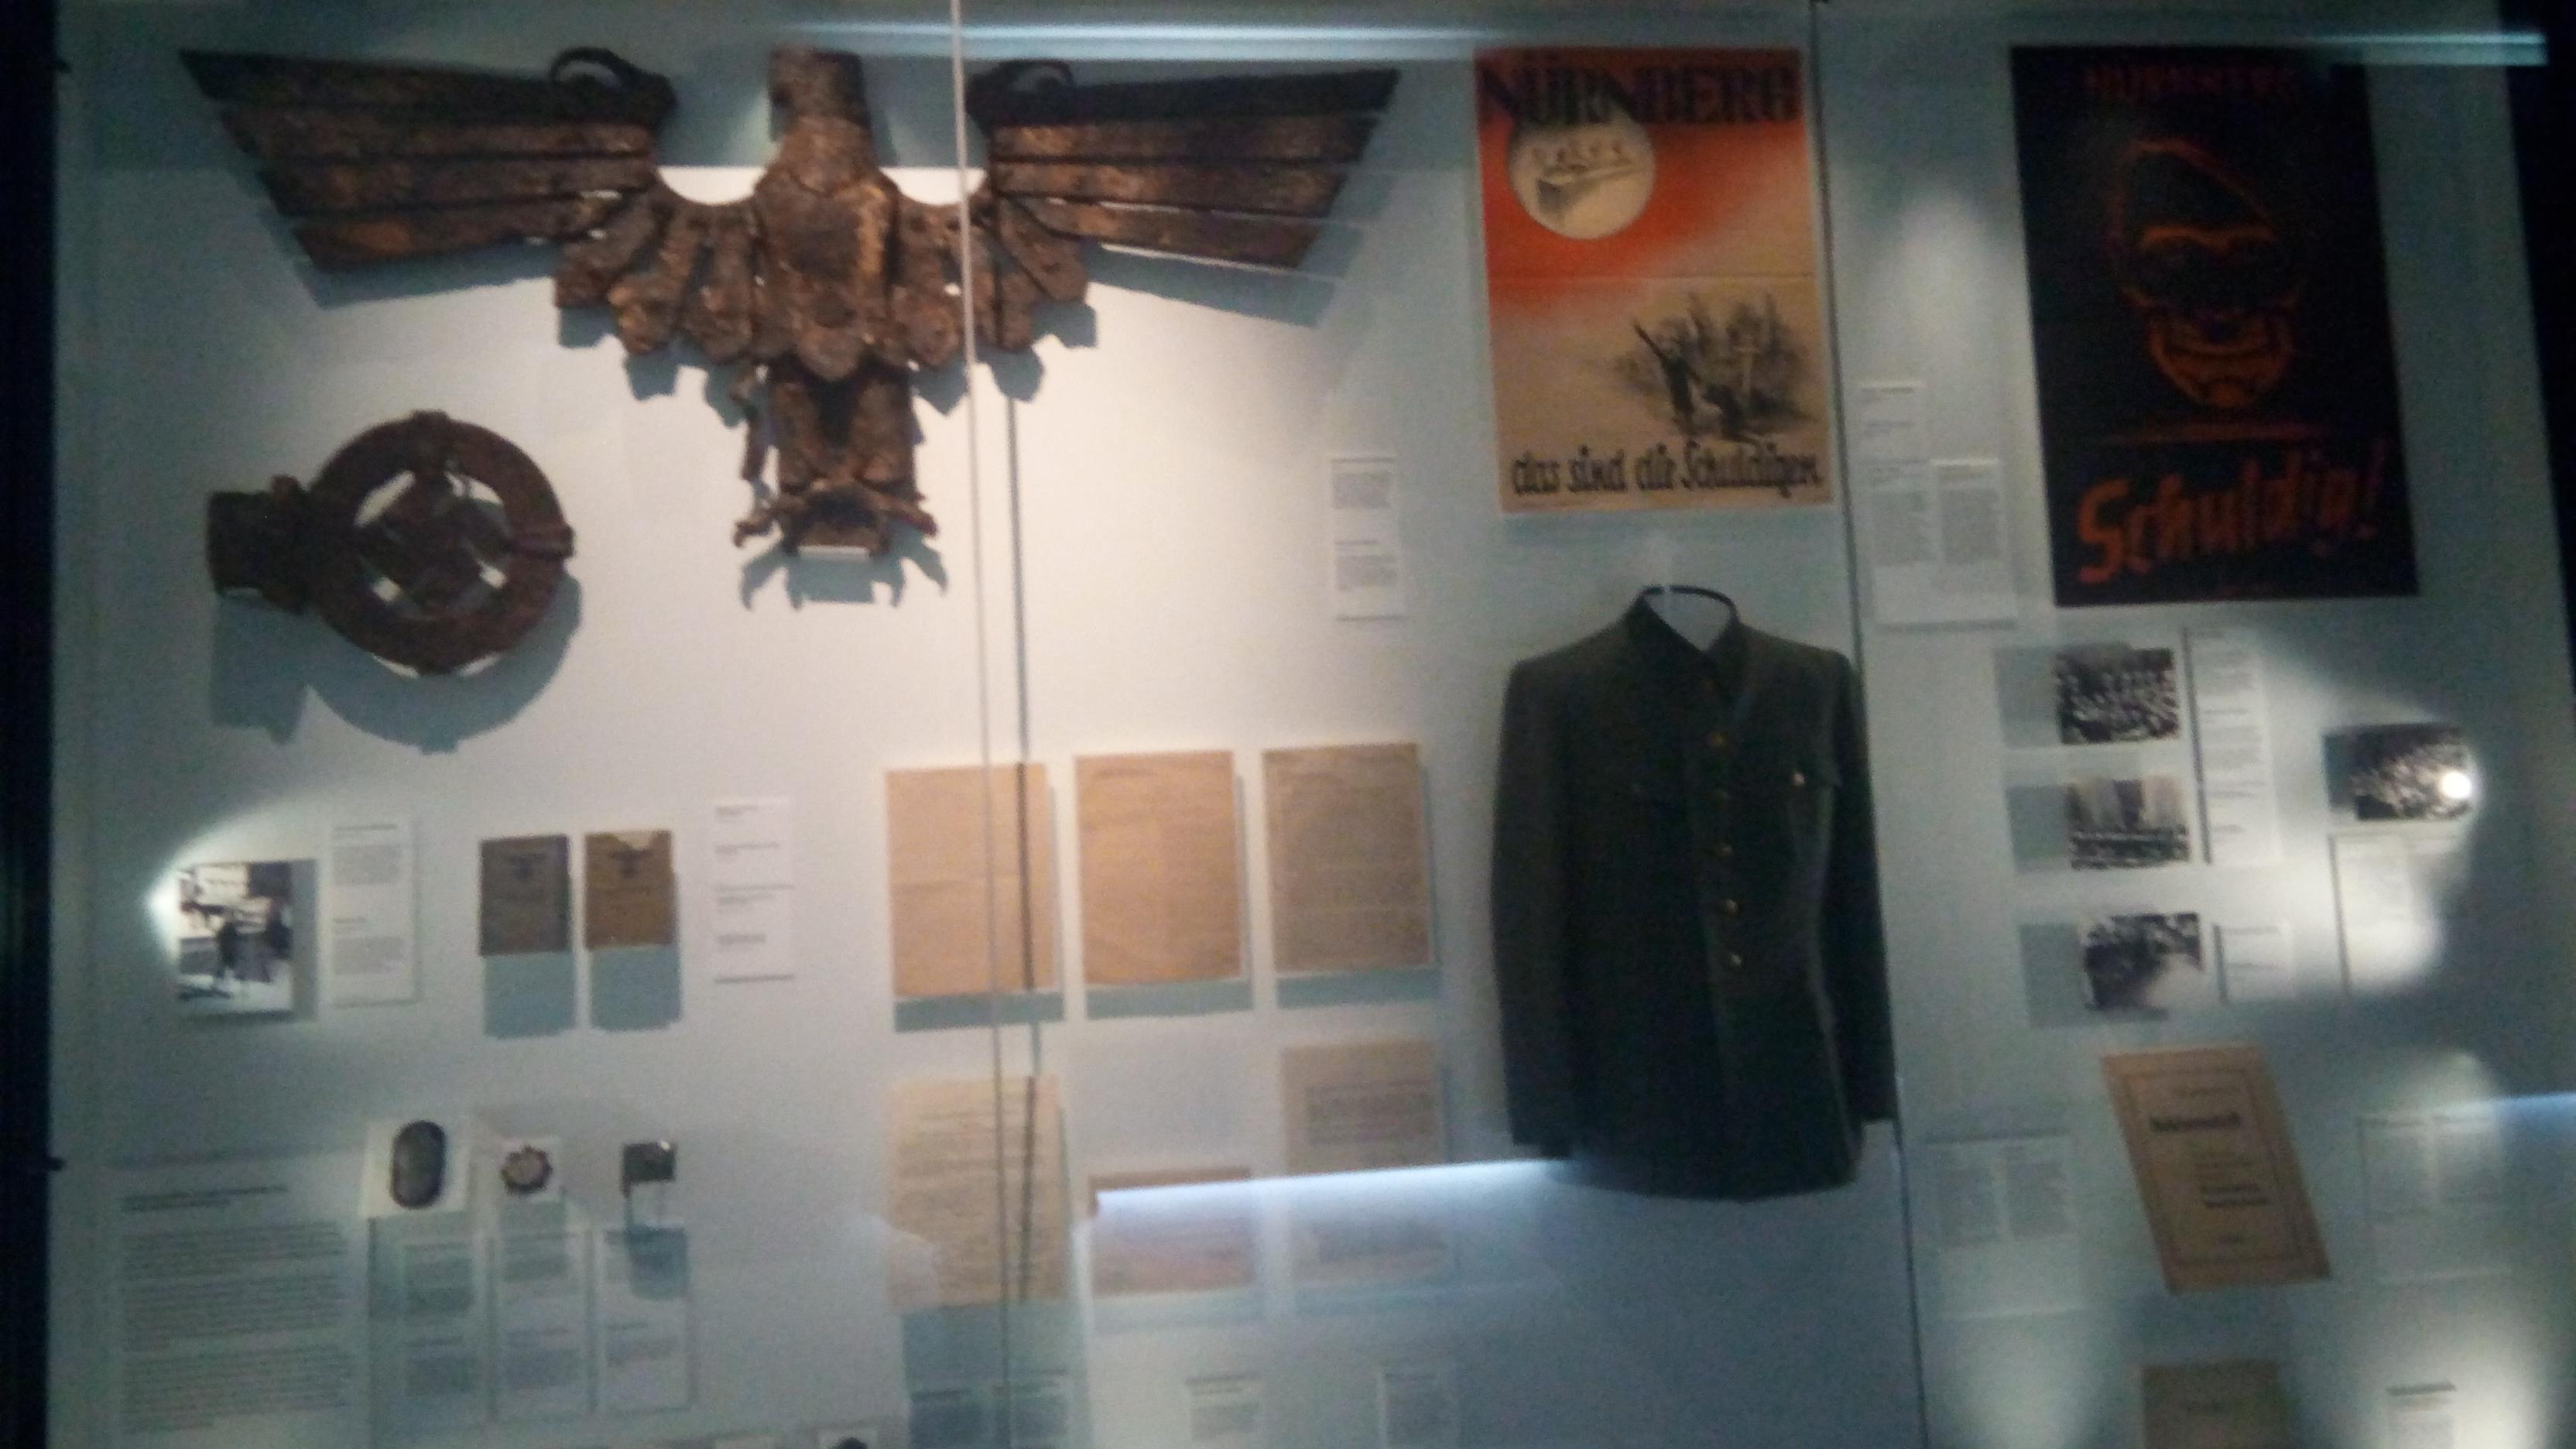 war-museum-2-german-emperialistic-eagle